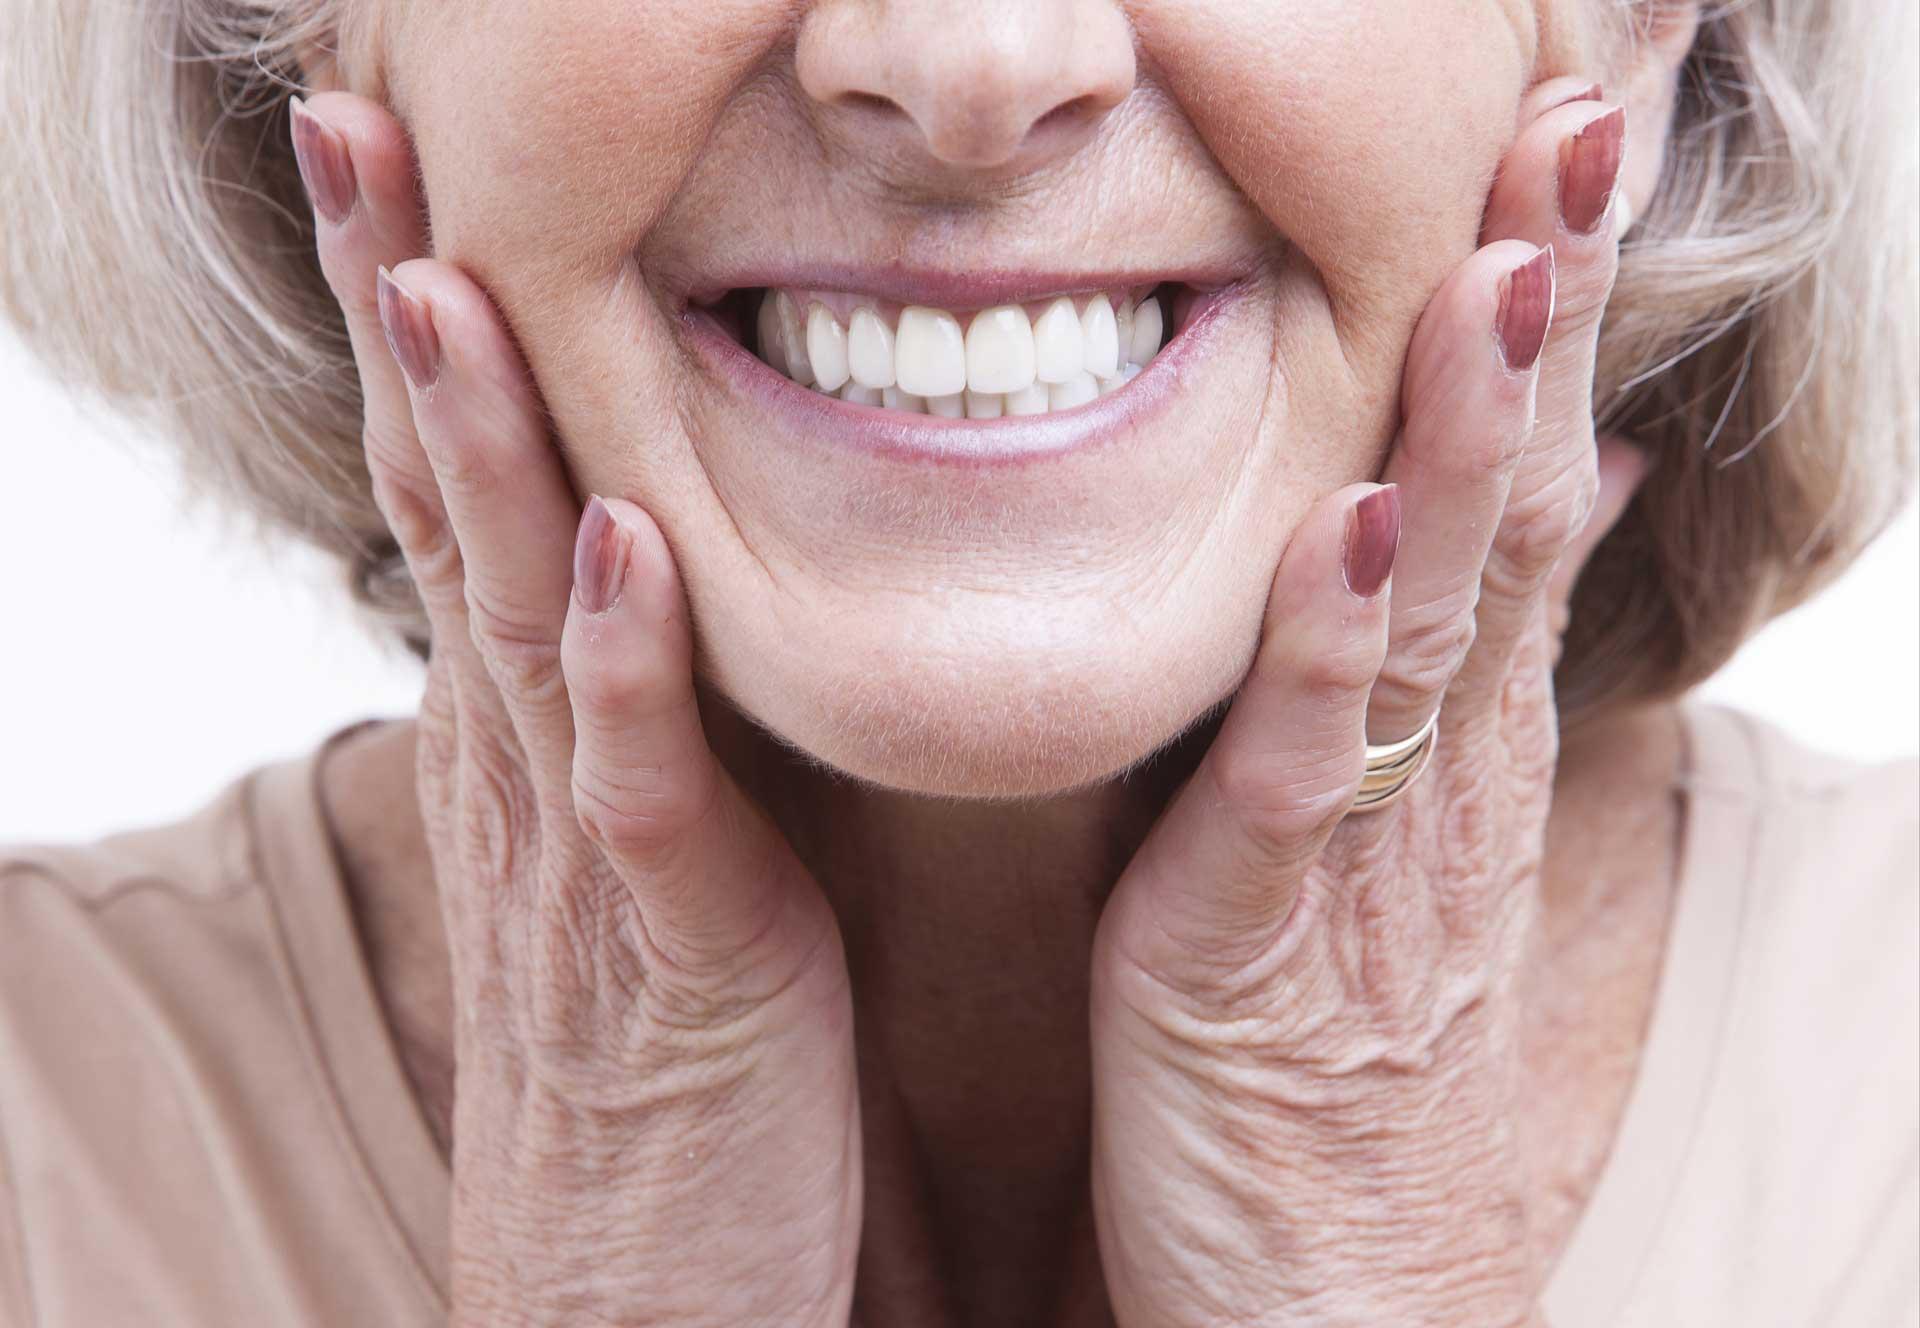 denture-care-by-malan-family-dentistry.jpg